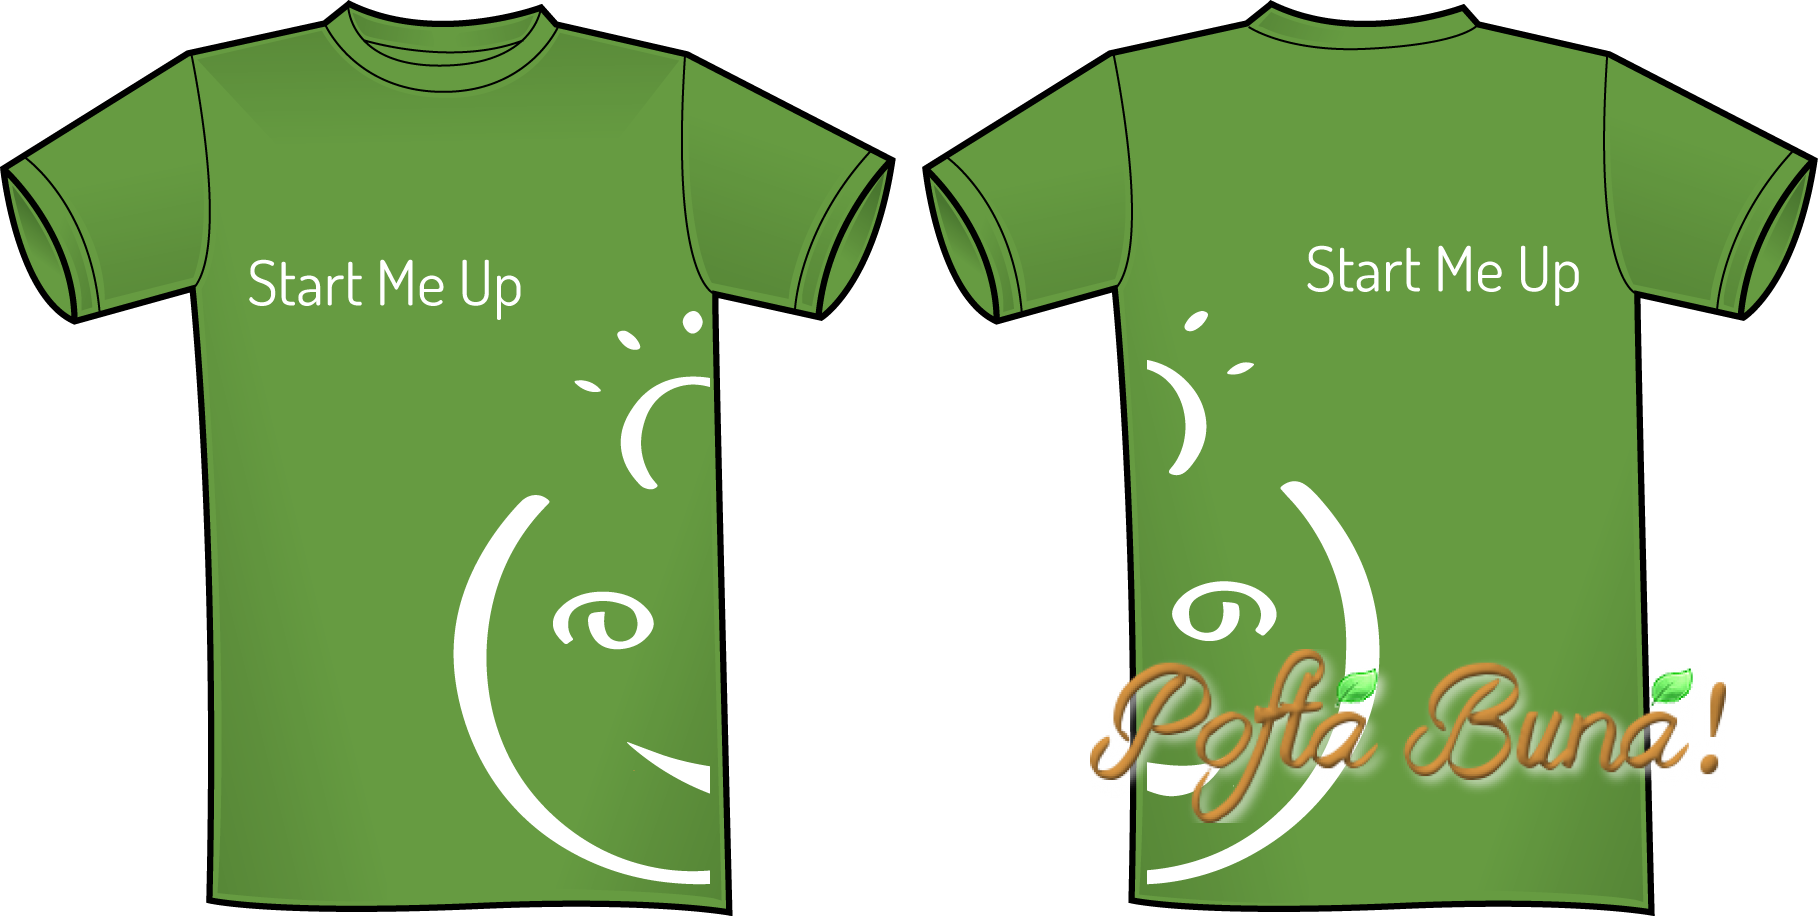 SMU Shirt - Cum sa fii propriul tau sef